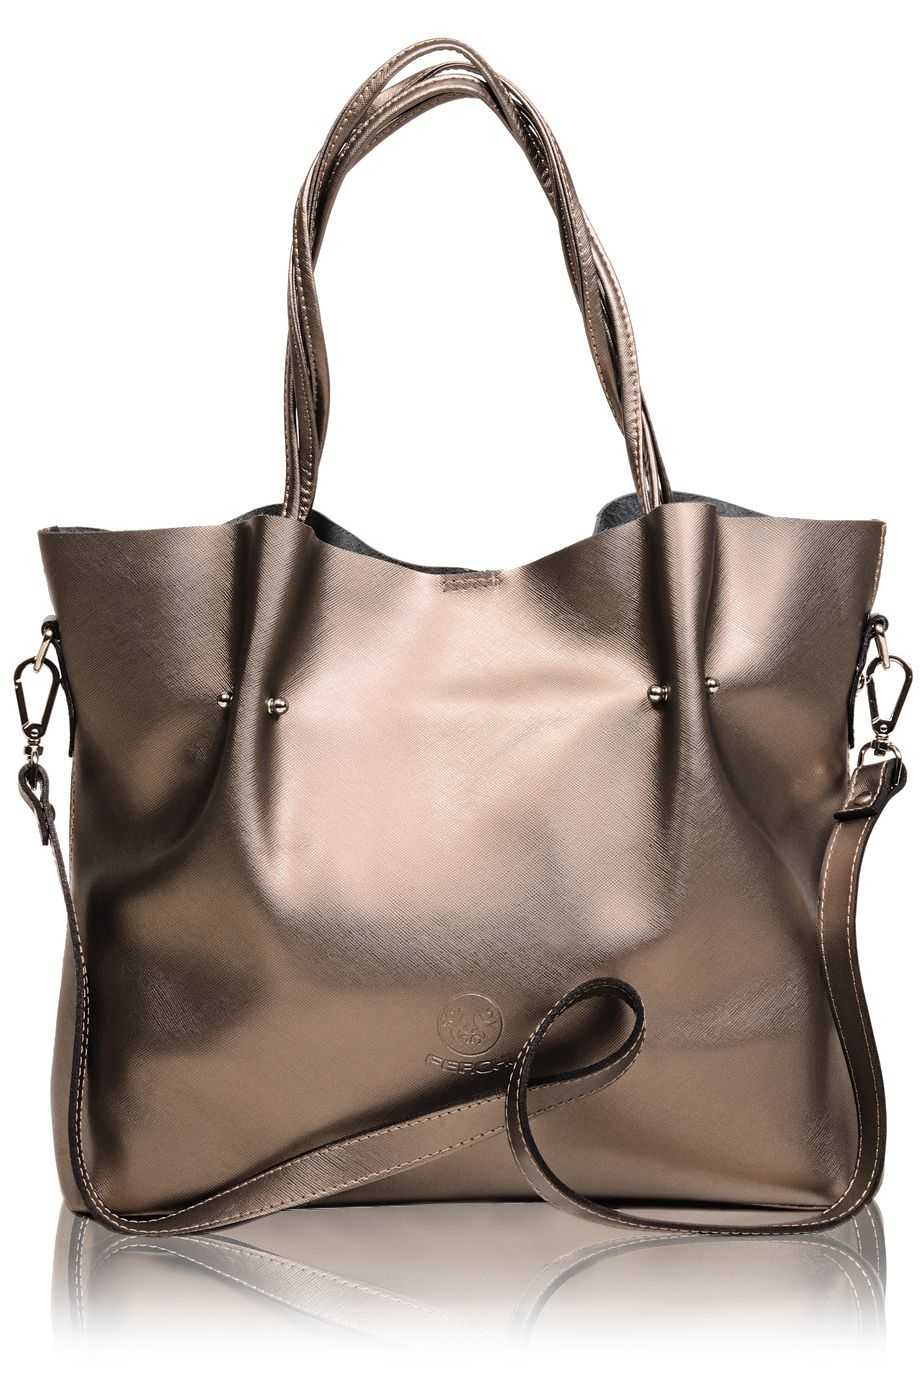 Ferchi Leather Handbags Totes Bags Bag Accessories Tote